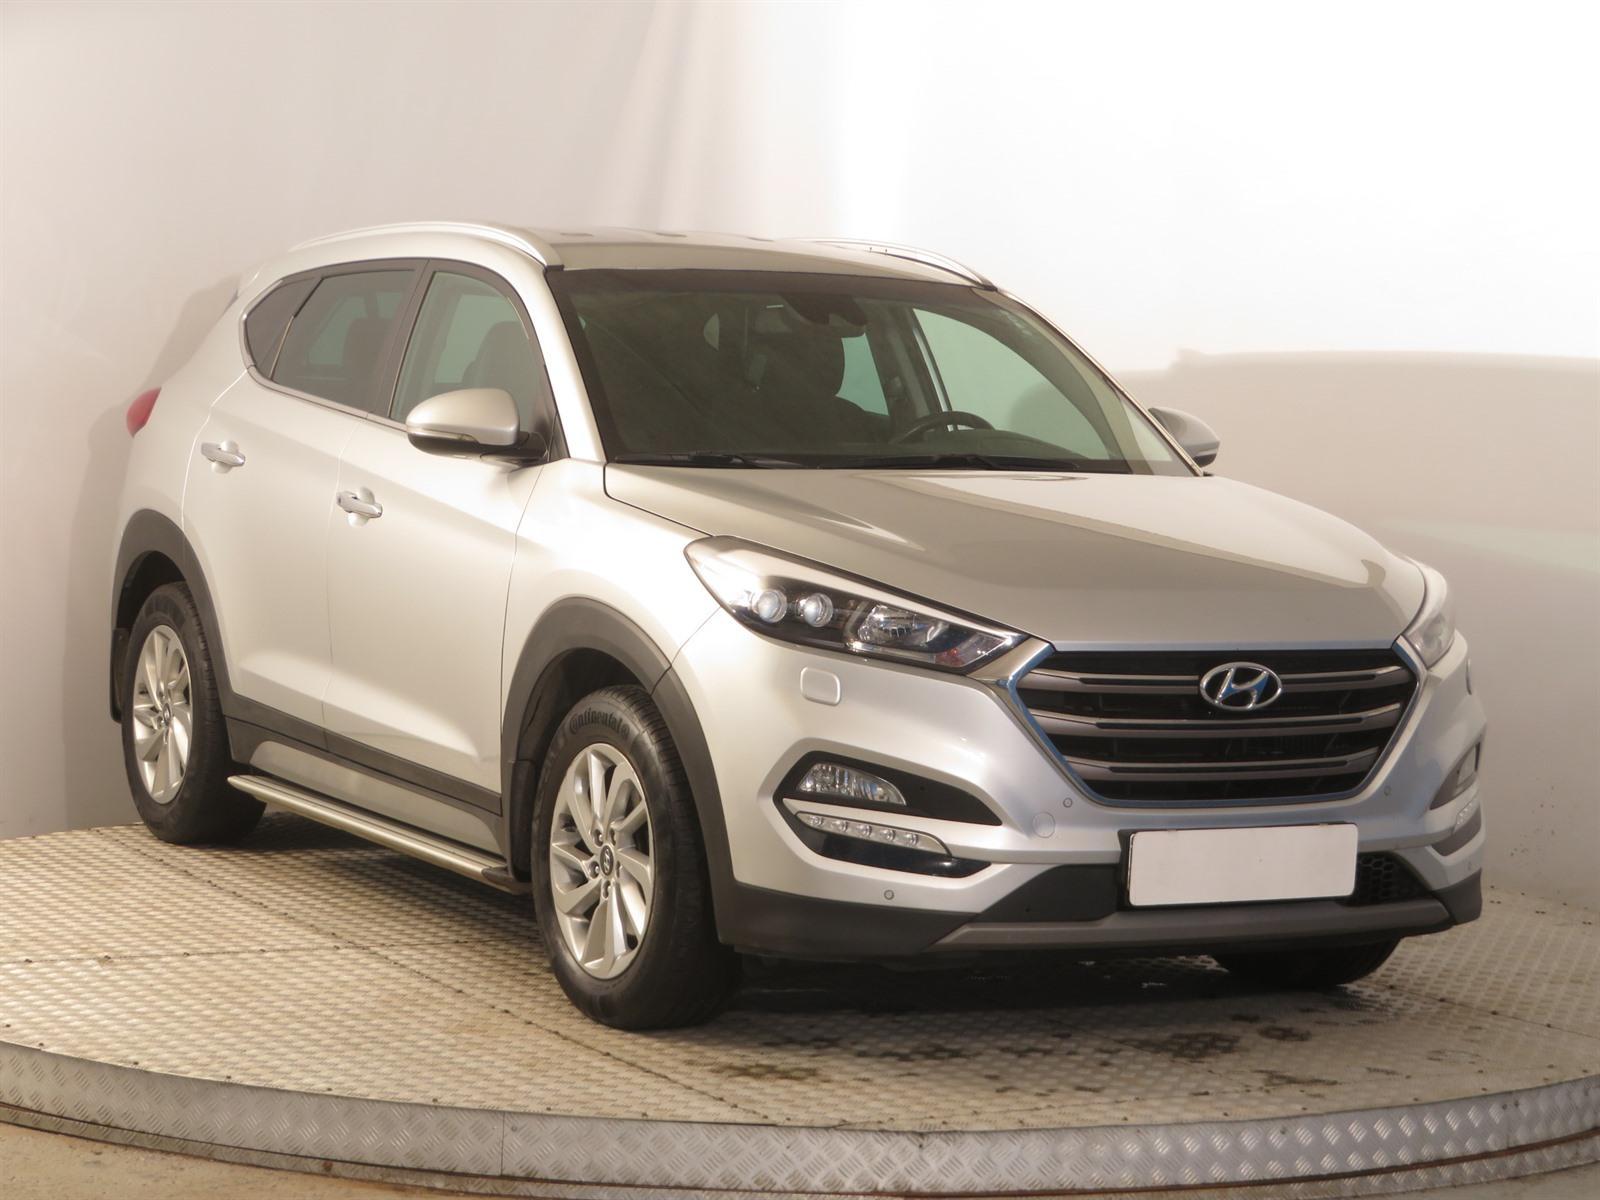 Hyundai Tucson 2.0 CRDi 100kW SUV nafta